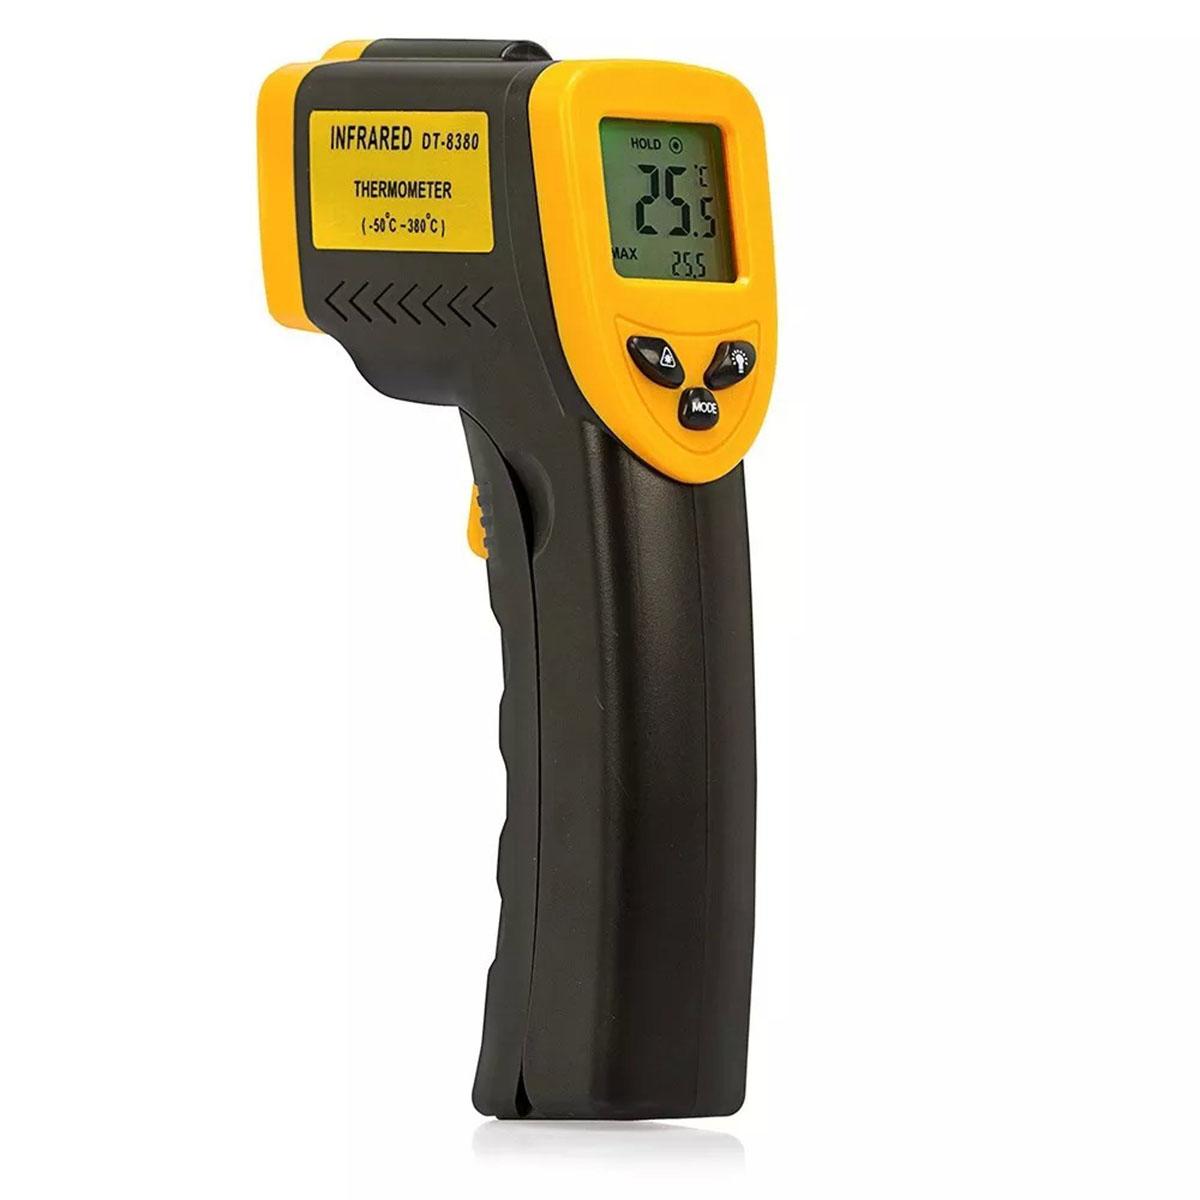 Termometro Digital Infravermelho com Mira Laser DT-8380